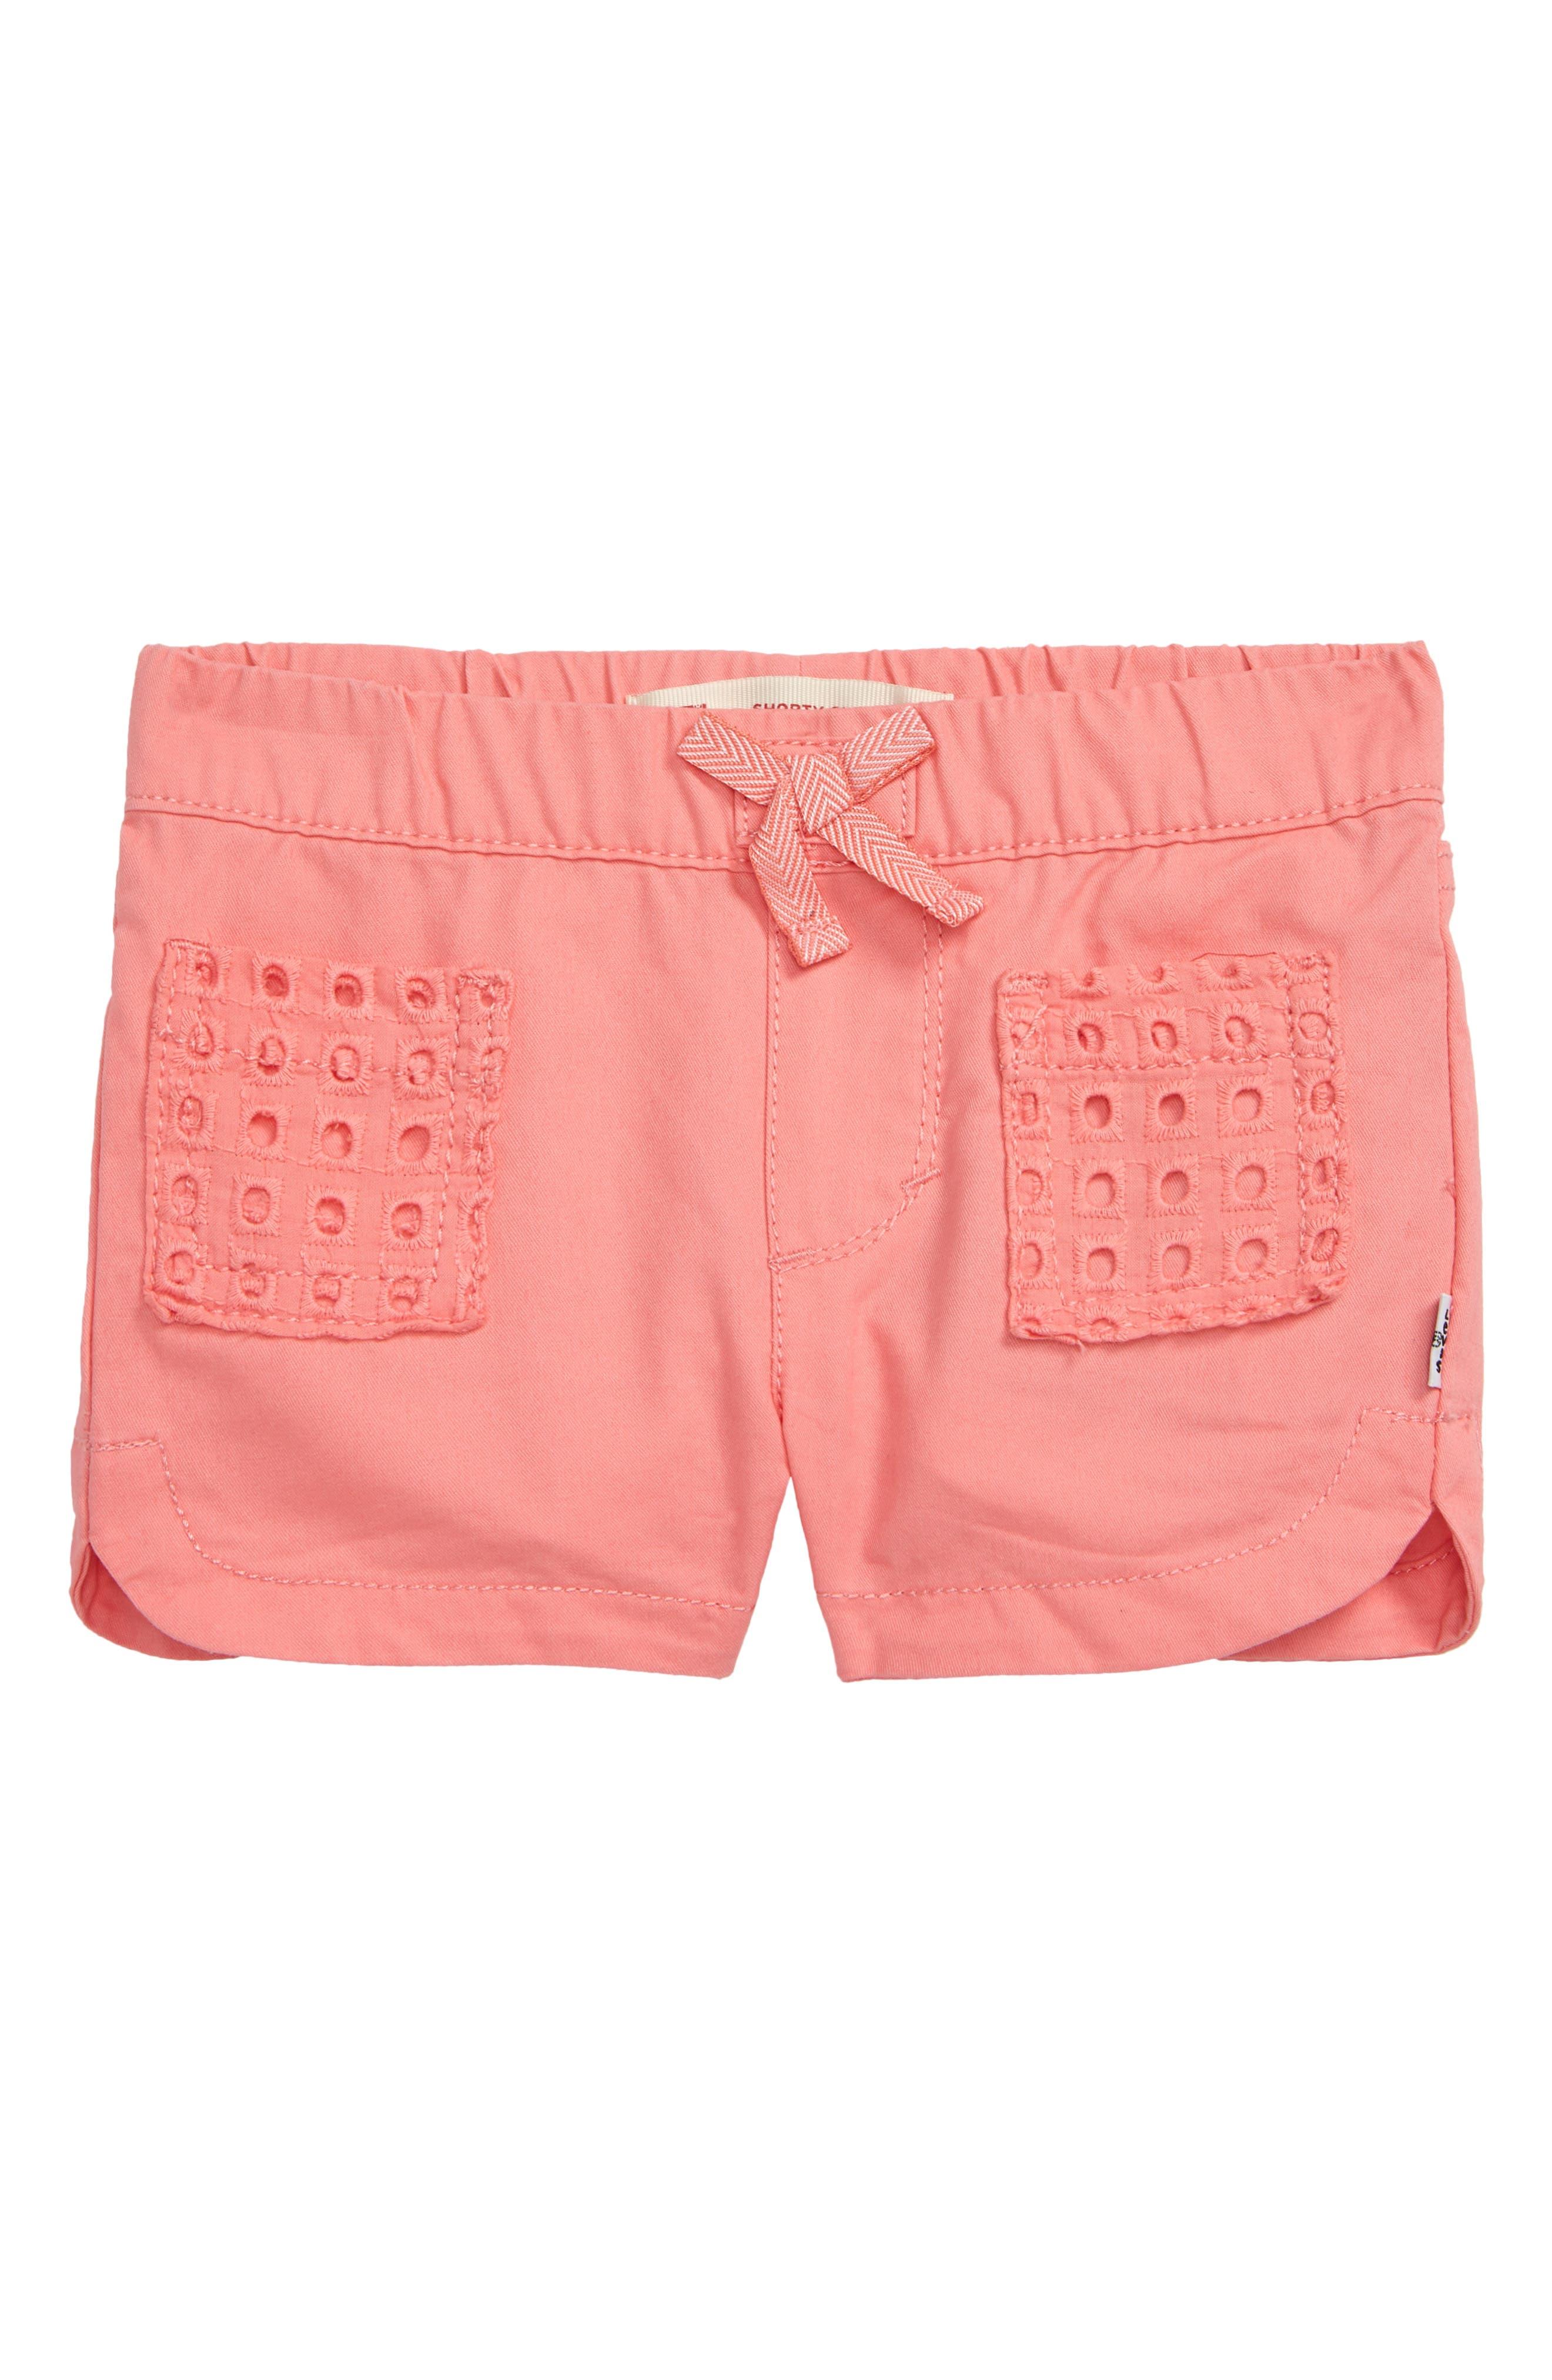 Image of Levi's Dolphin Shorty Shorts (Baby Girls)